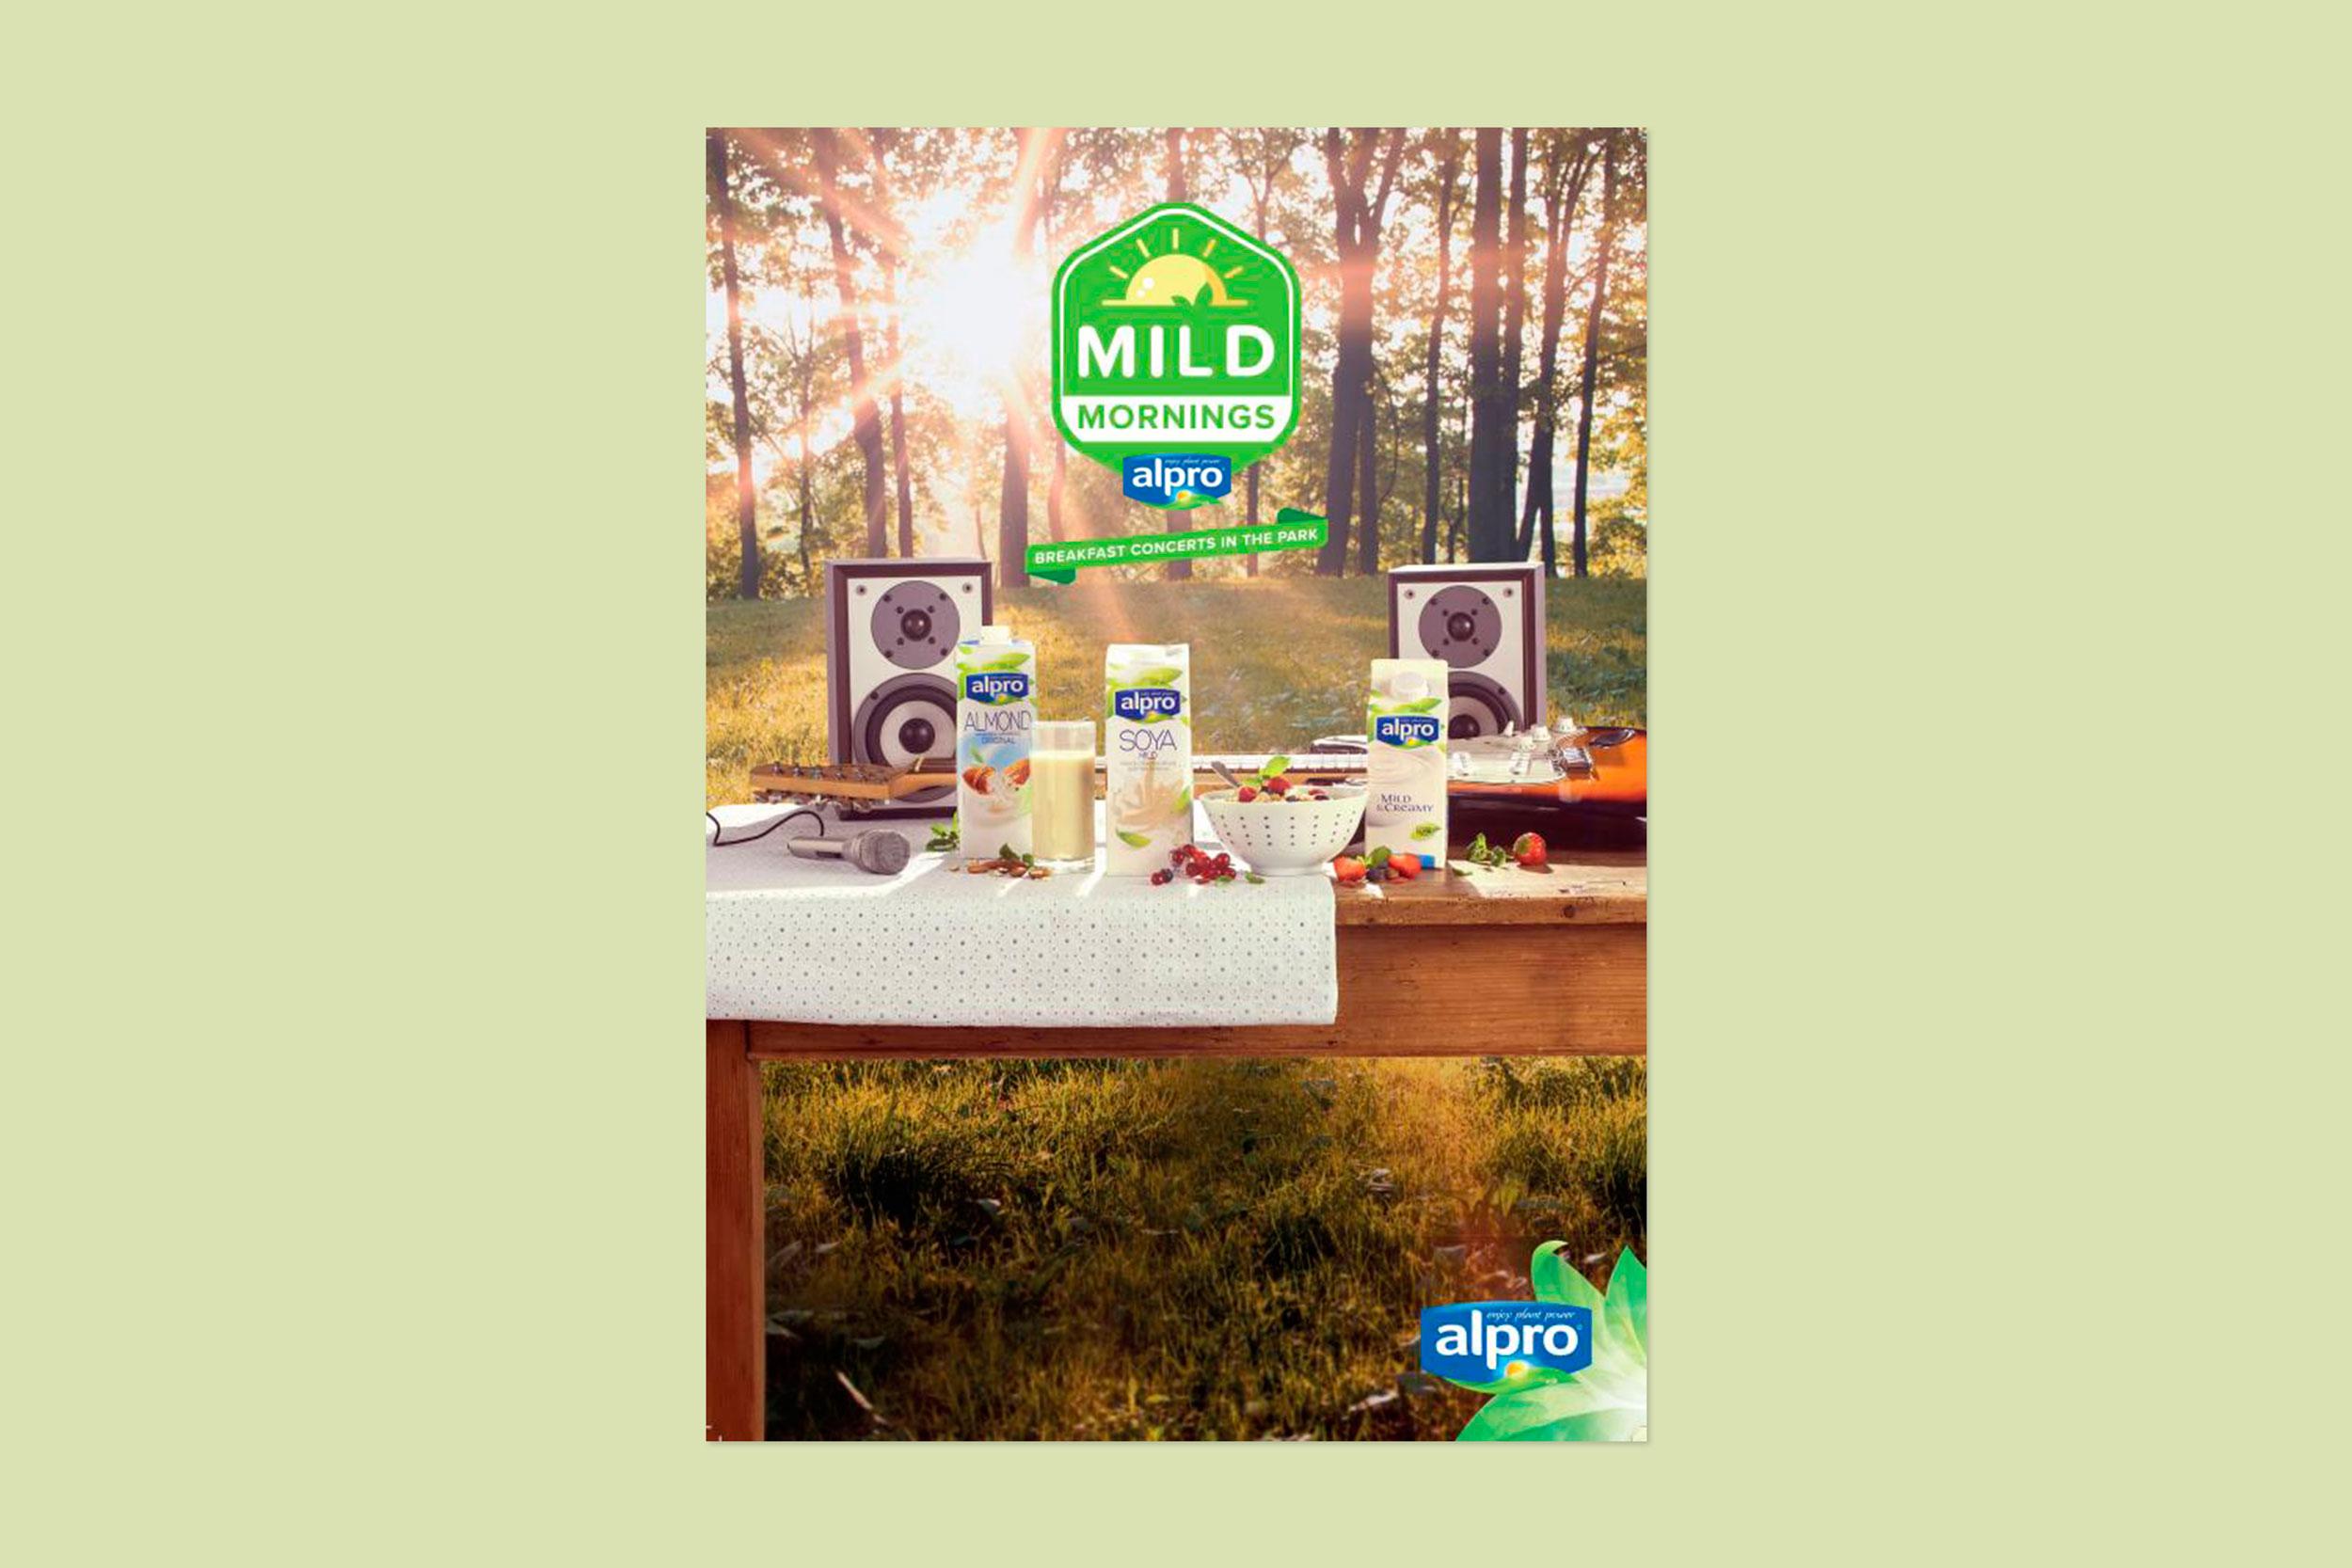 Alpro Mild Mornings advertisement